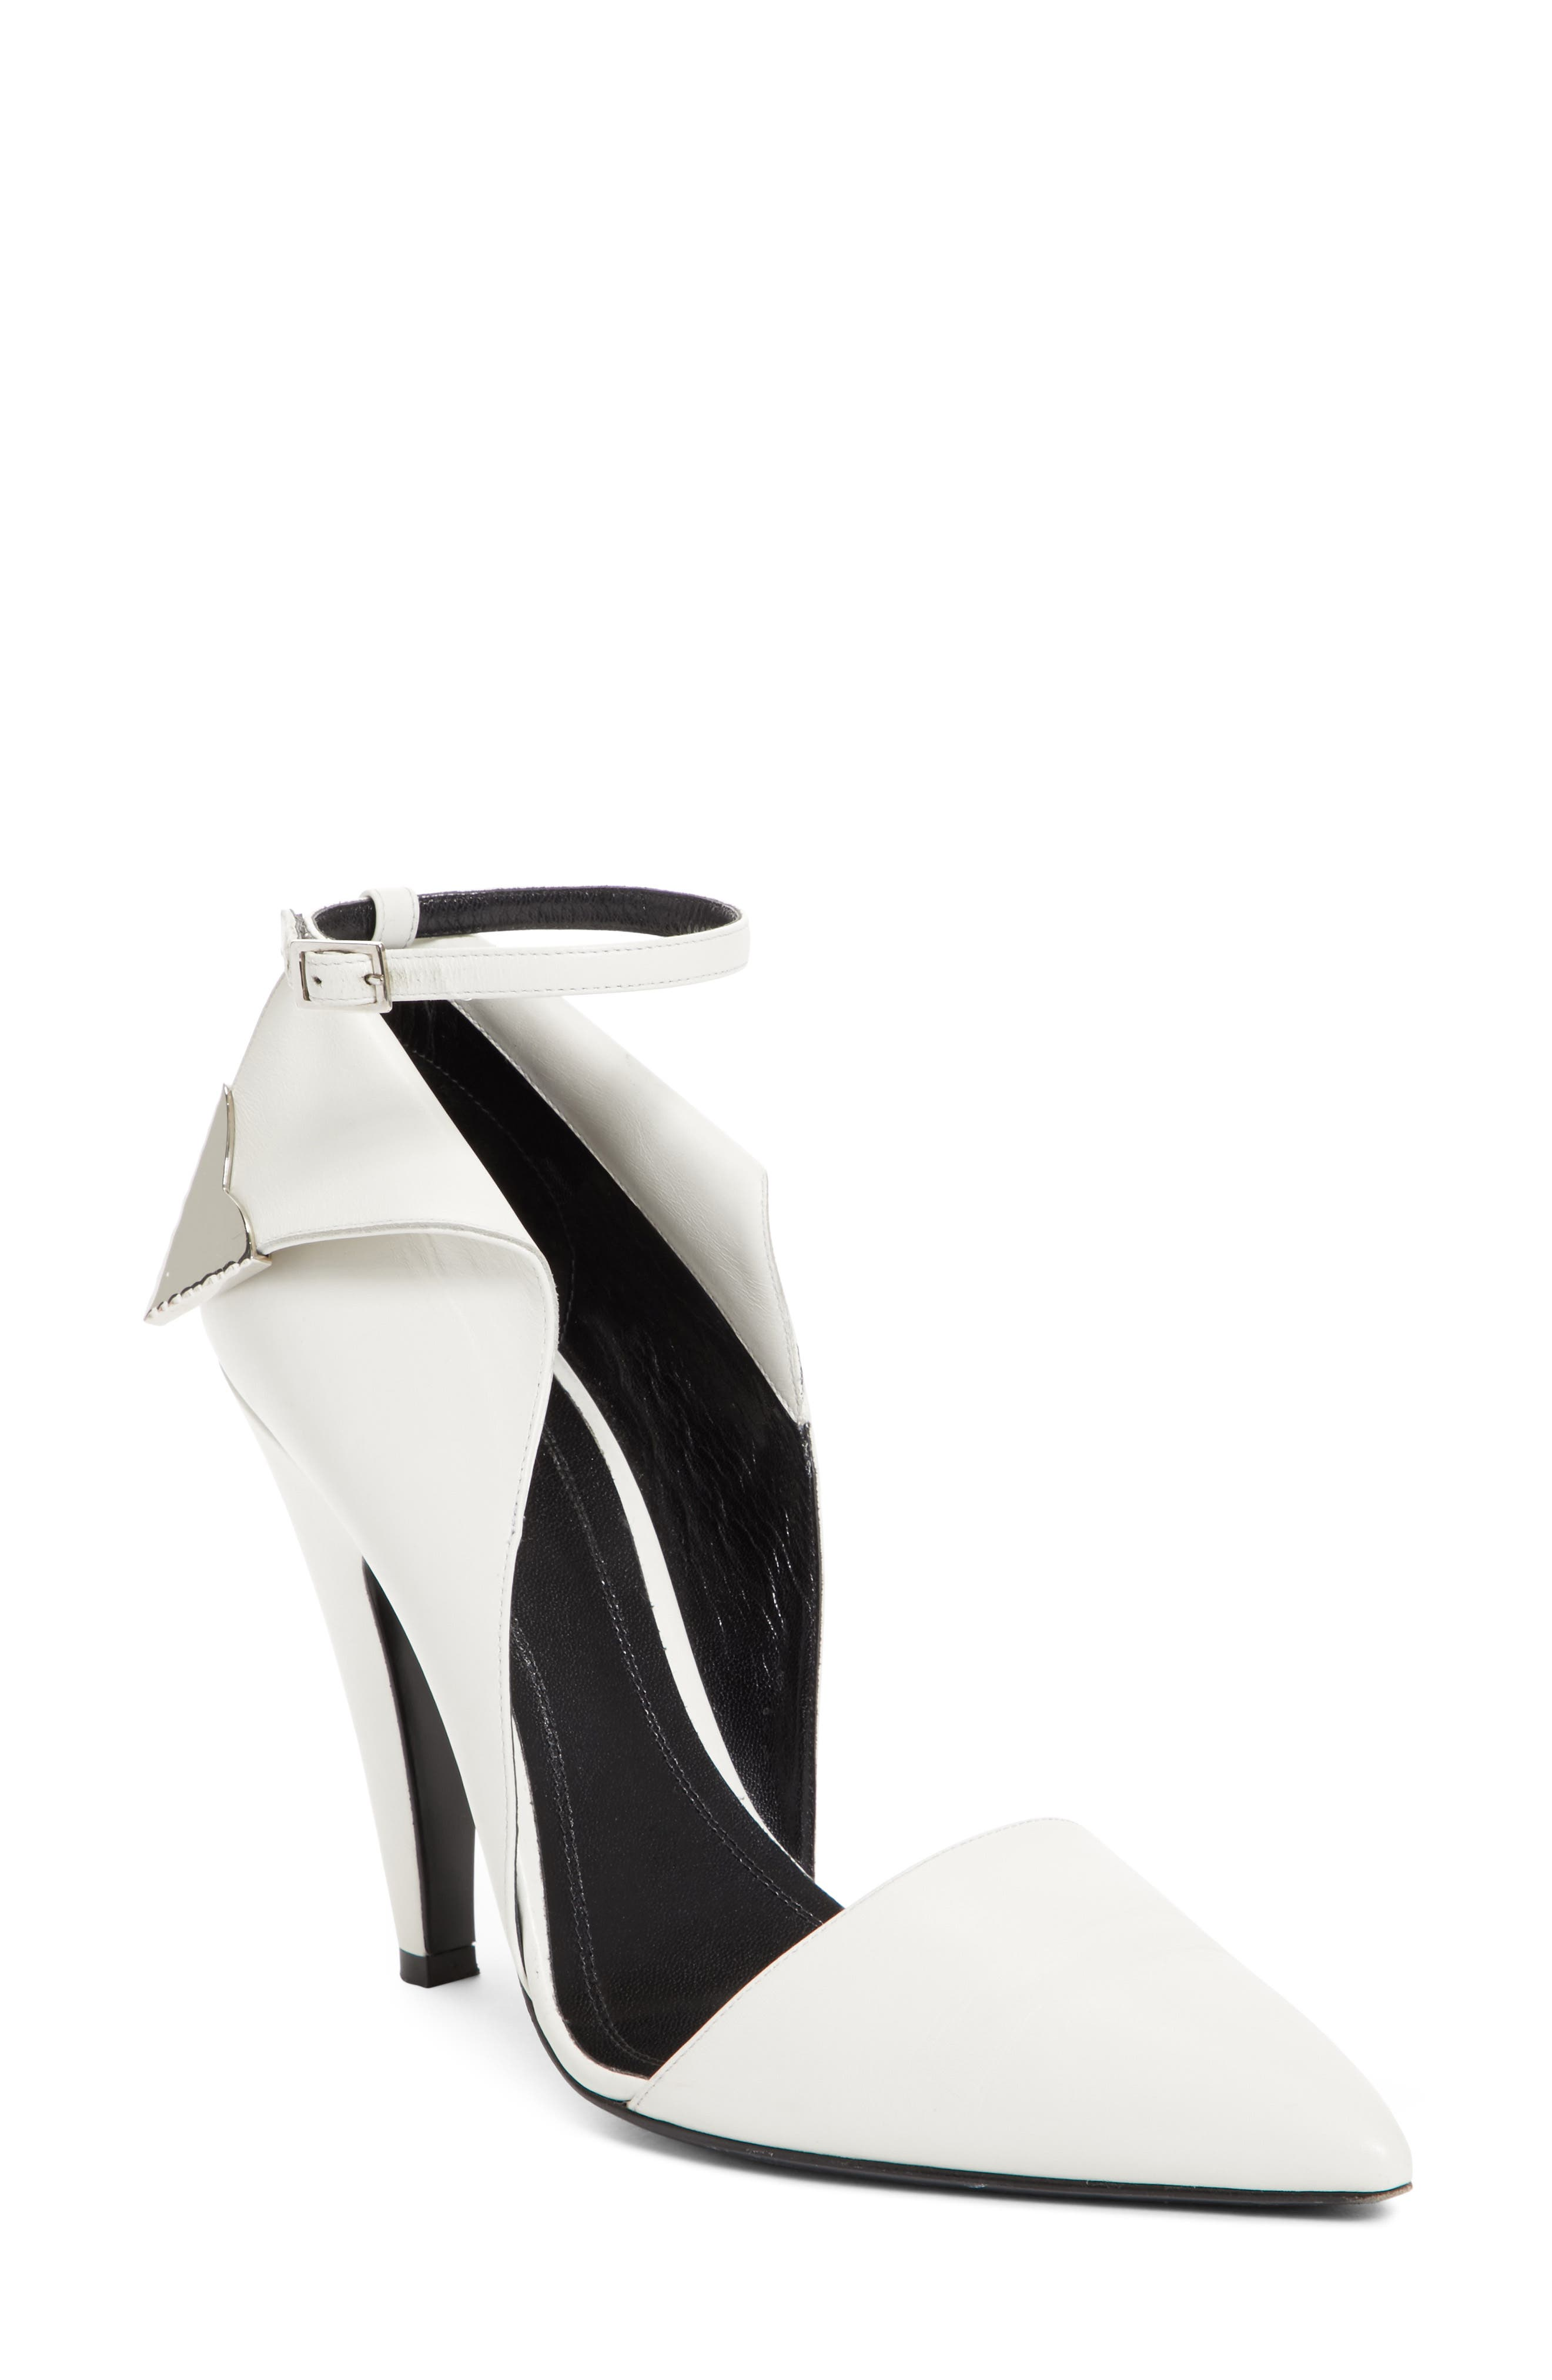 Kadence Ankle Strap Pump,                         Main,                         color, White